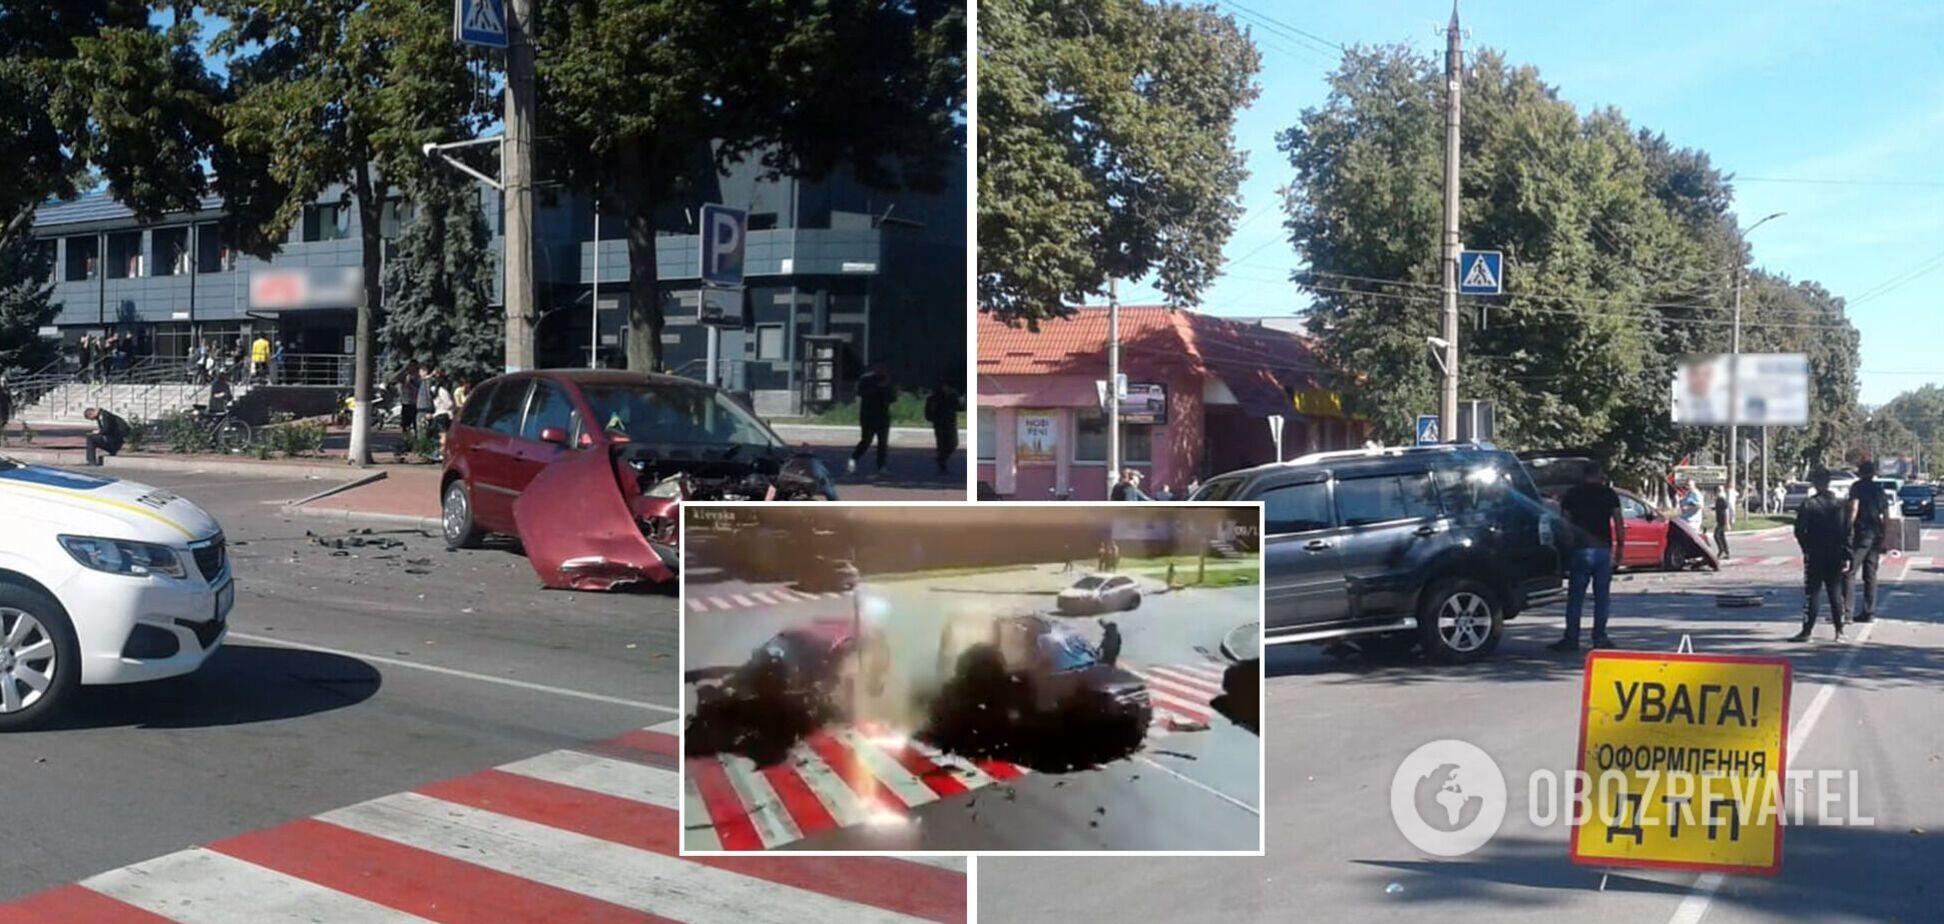 На Черниговщине мужчина чудом спасся во время ДТП: авто пронеслось прямо перед ним. Видео